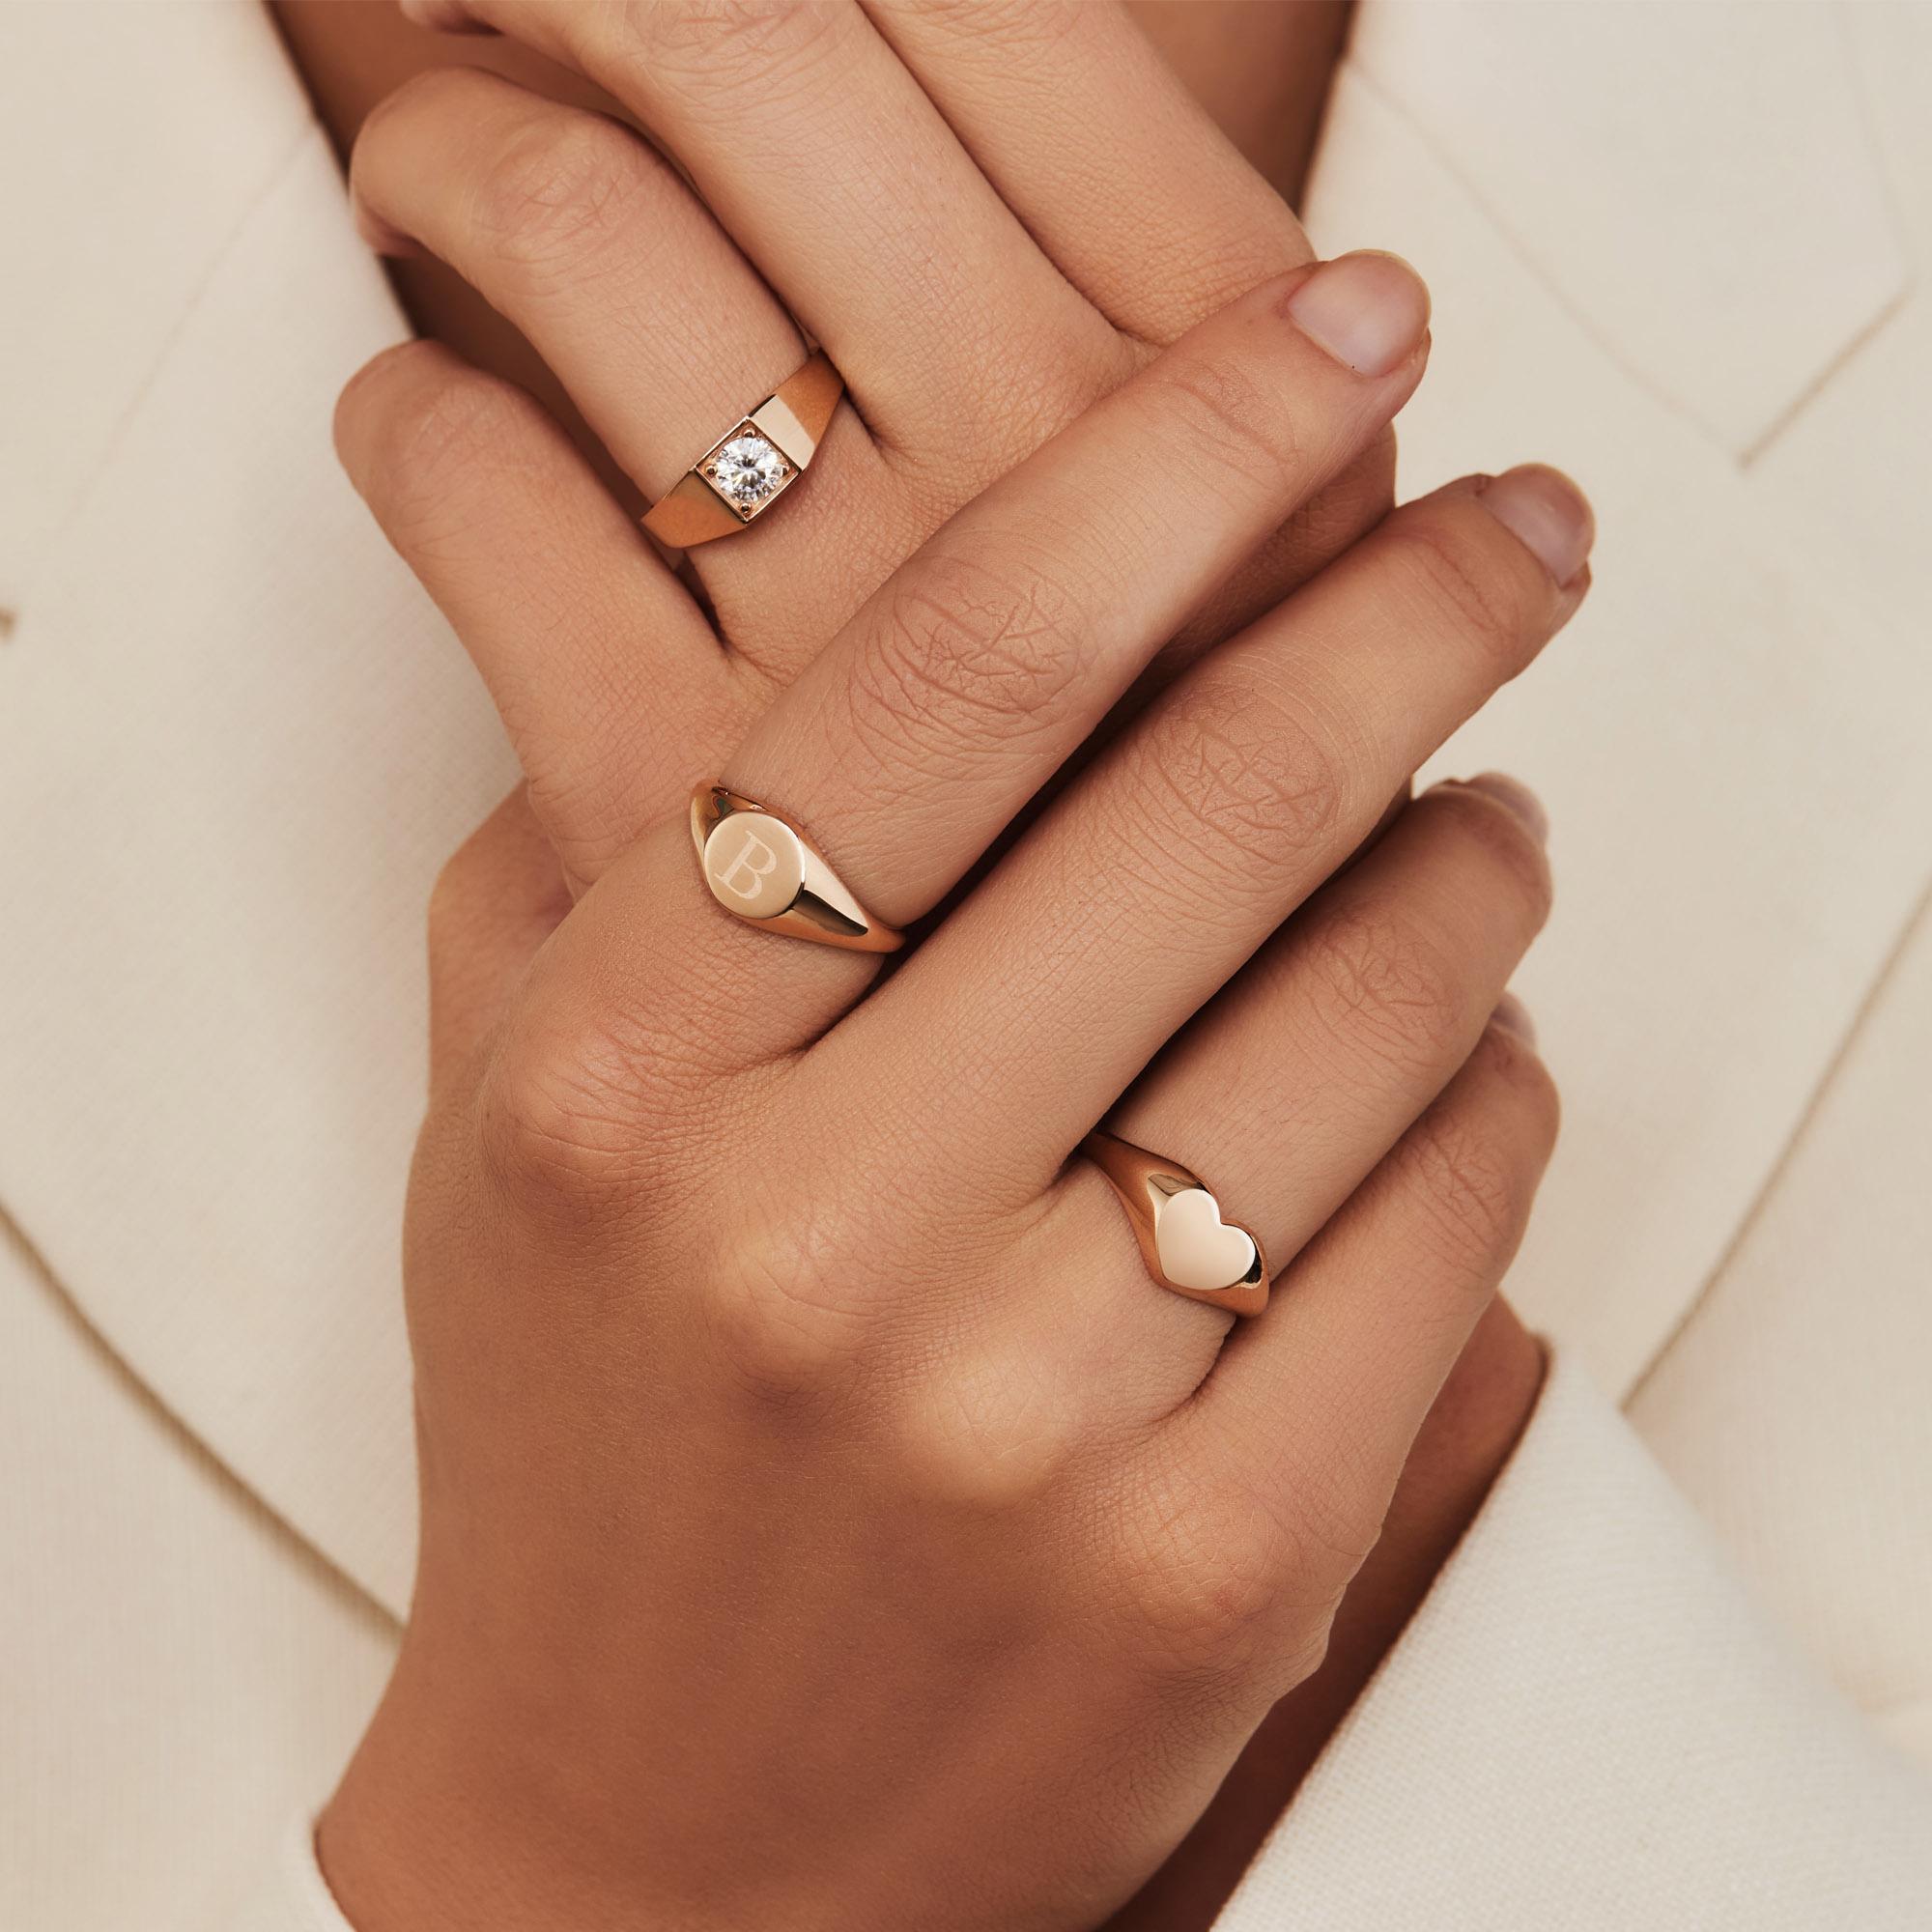 Isabel Bernard La Concorde Lauren 14 karat rose guld initial signet ring (54)